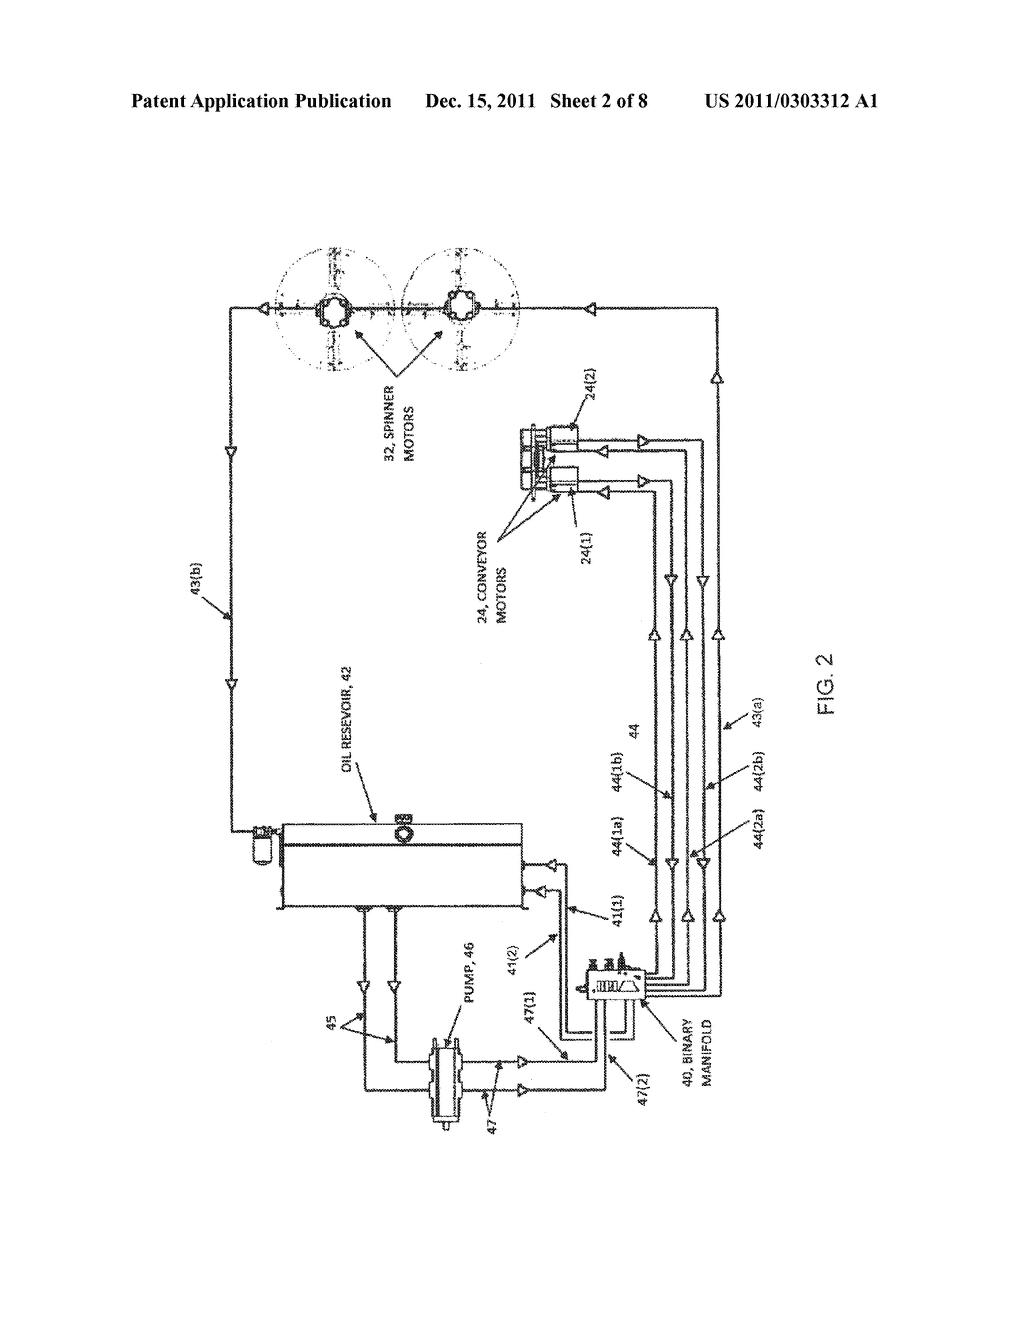 Hydraulic Conveyor Schematic